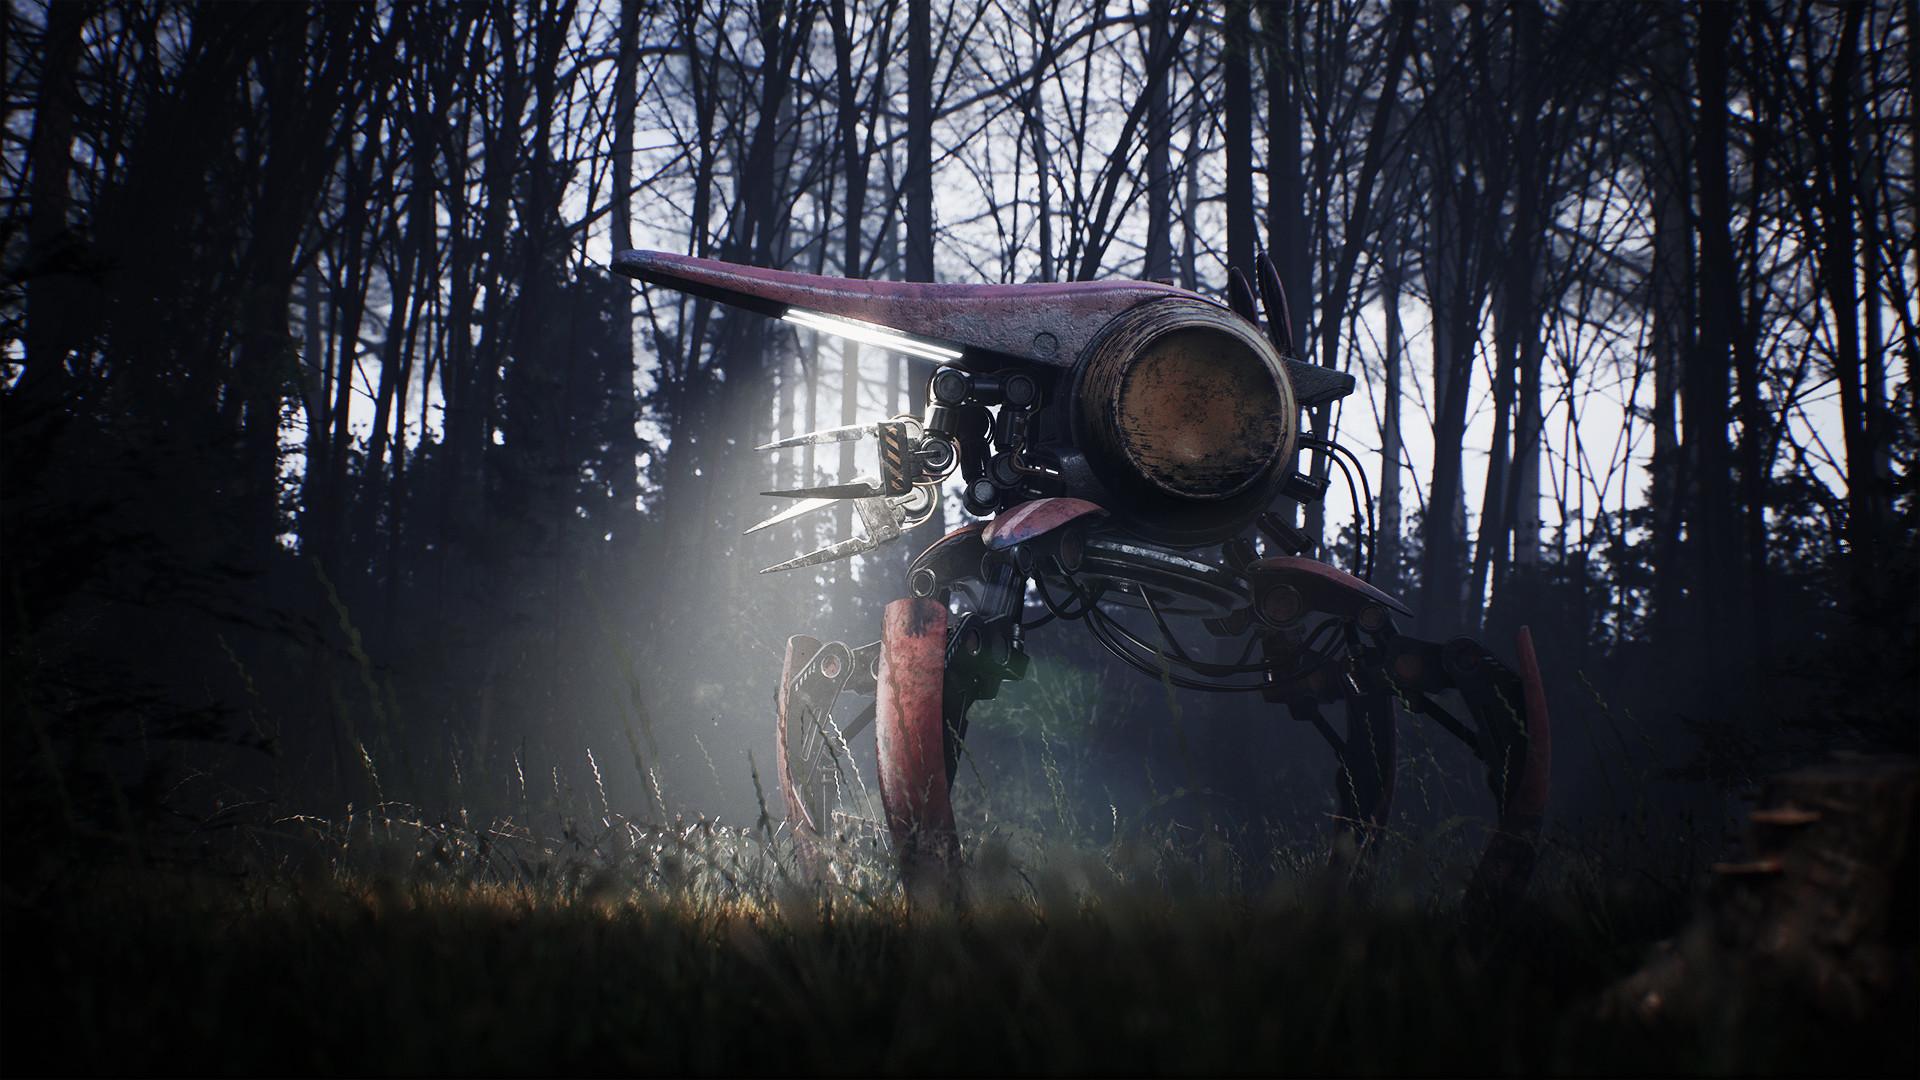 Wiktor ohman abandoned drone 1